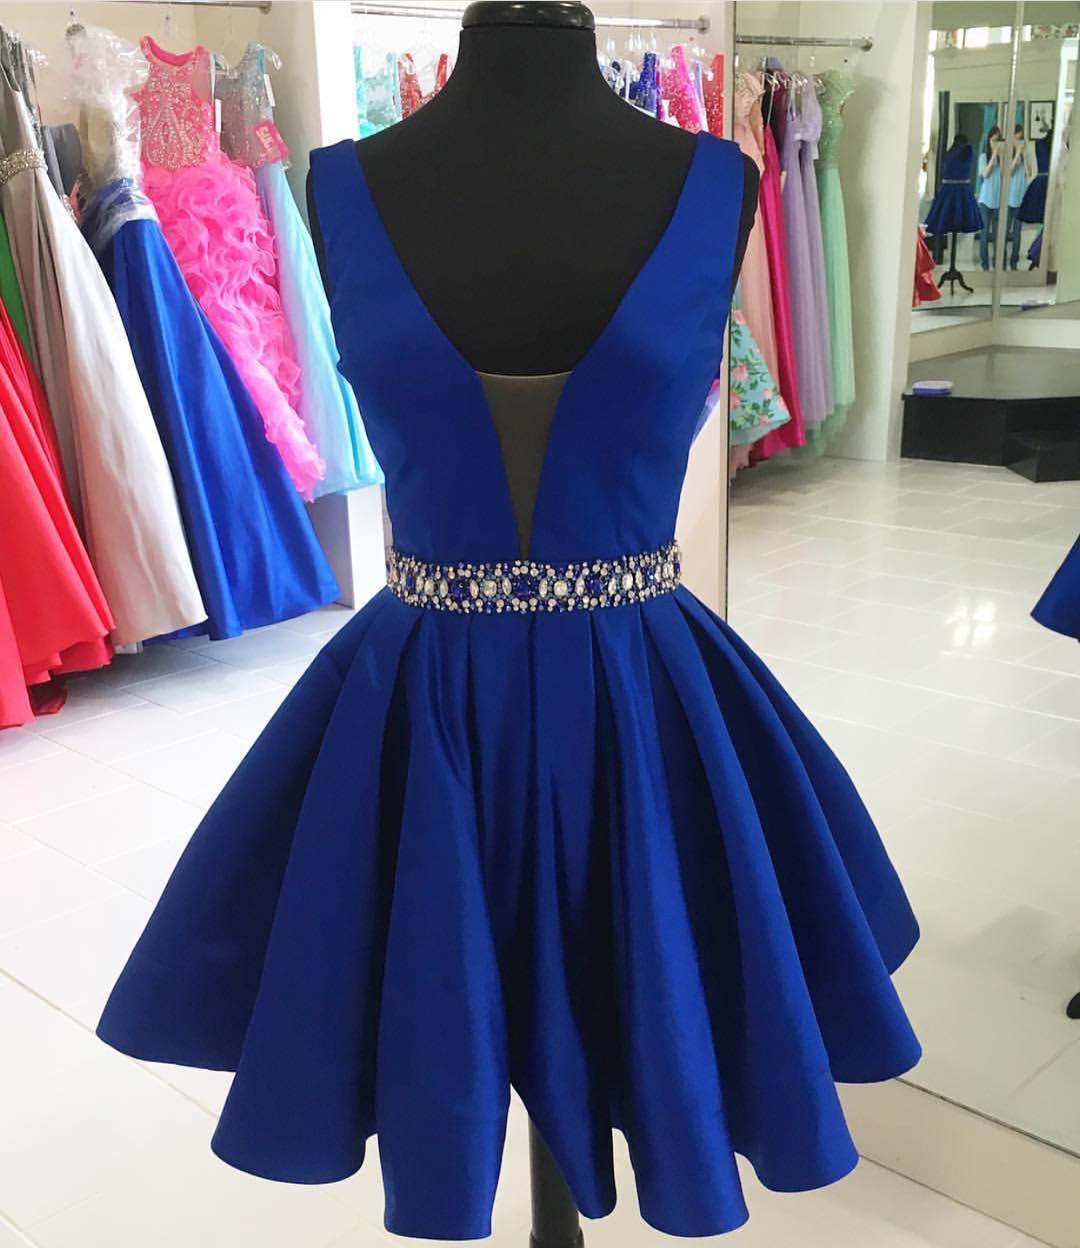 d6d24a553e High Fashion A-Line V-Neck Royal Blue Short Homecoming Dress with ...